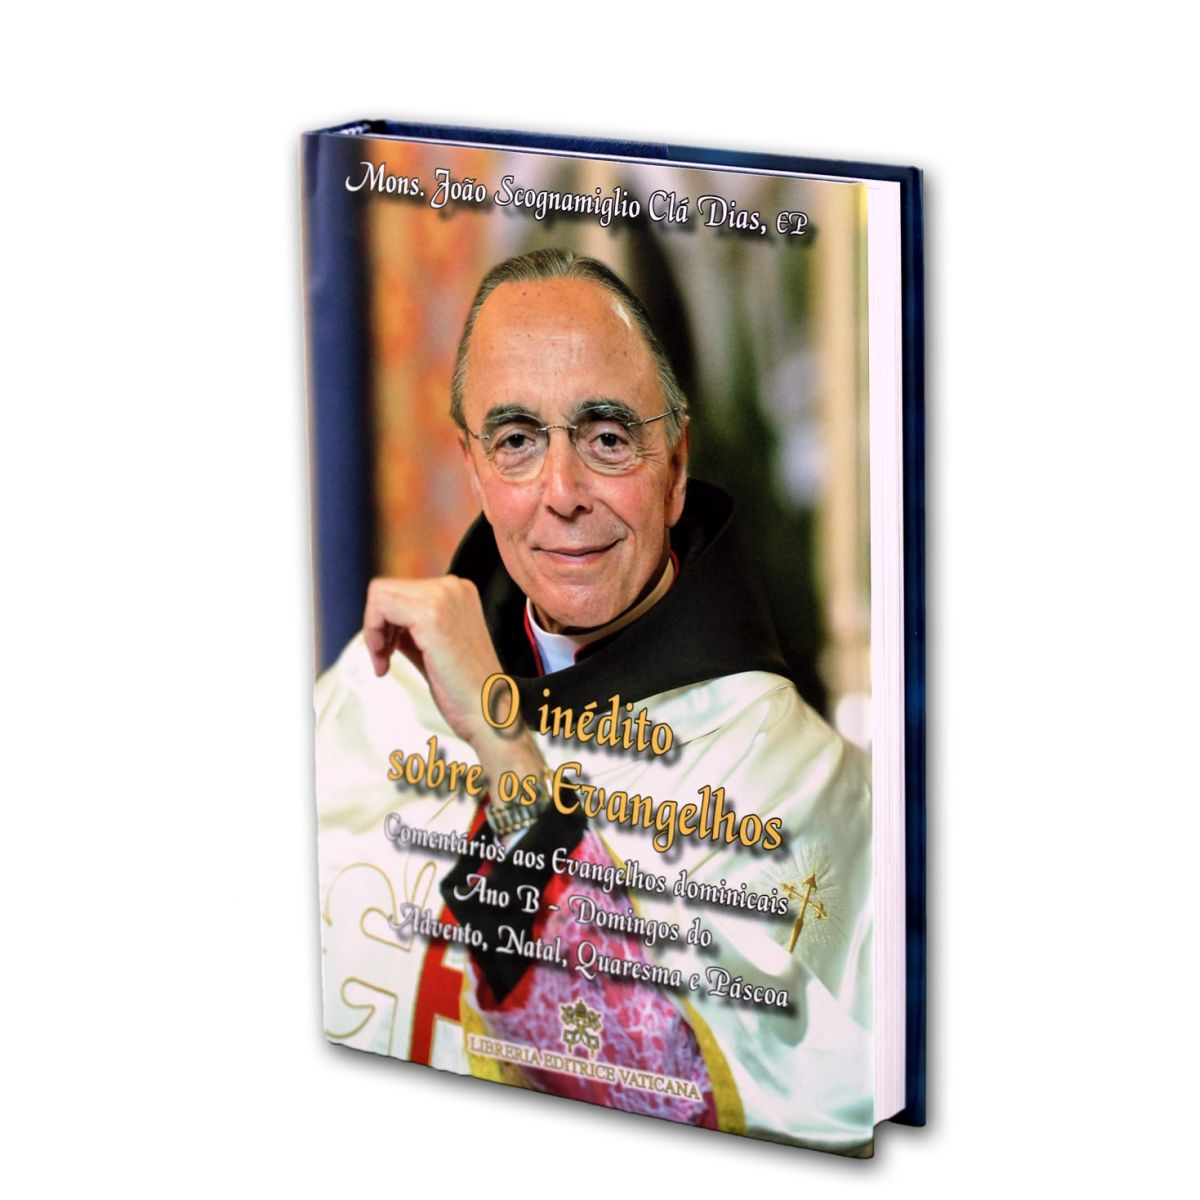 O Inédito sobre os Evangelhos - Ano B - Volume III - Brochura